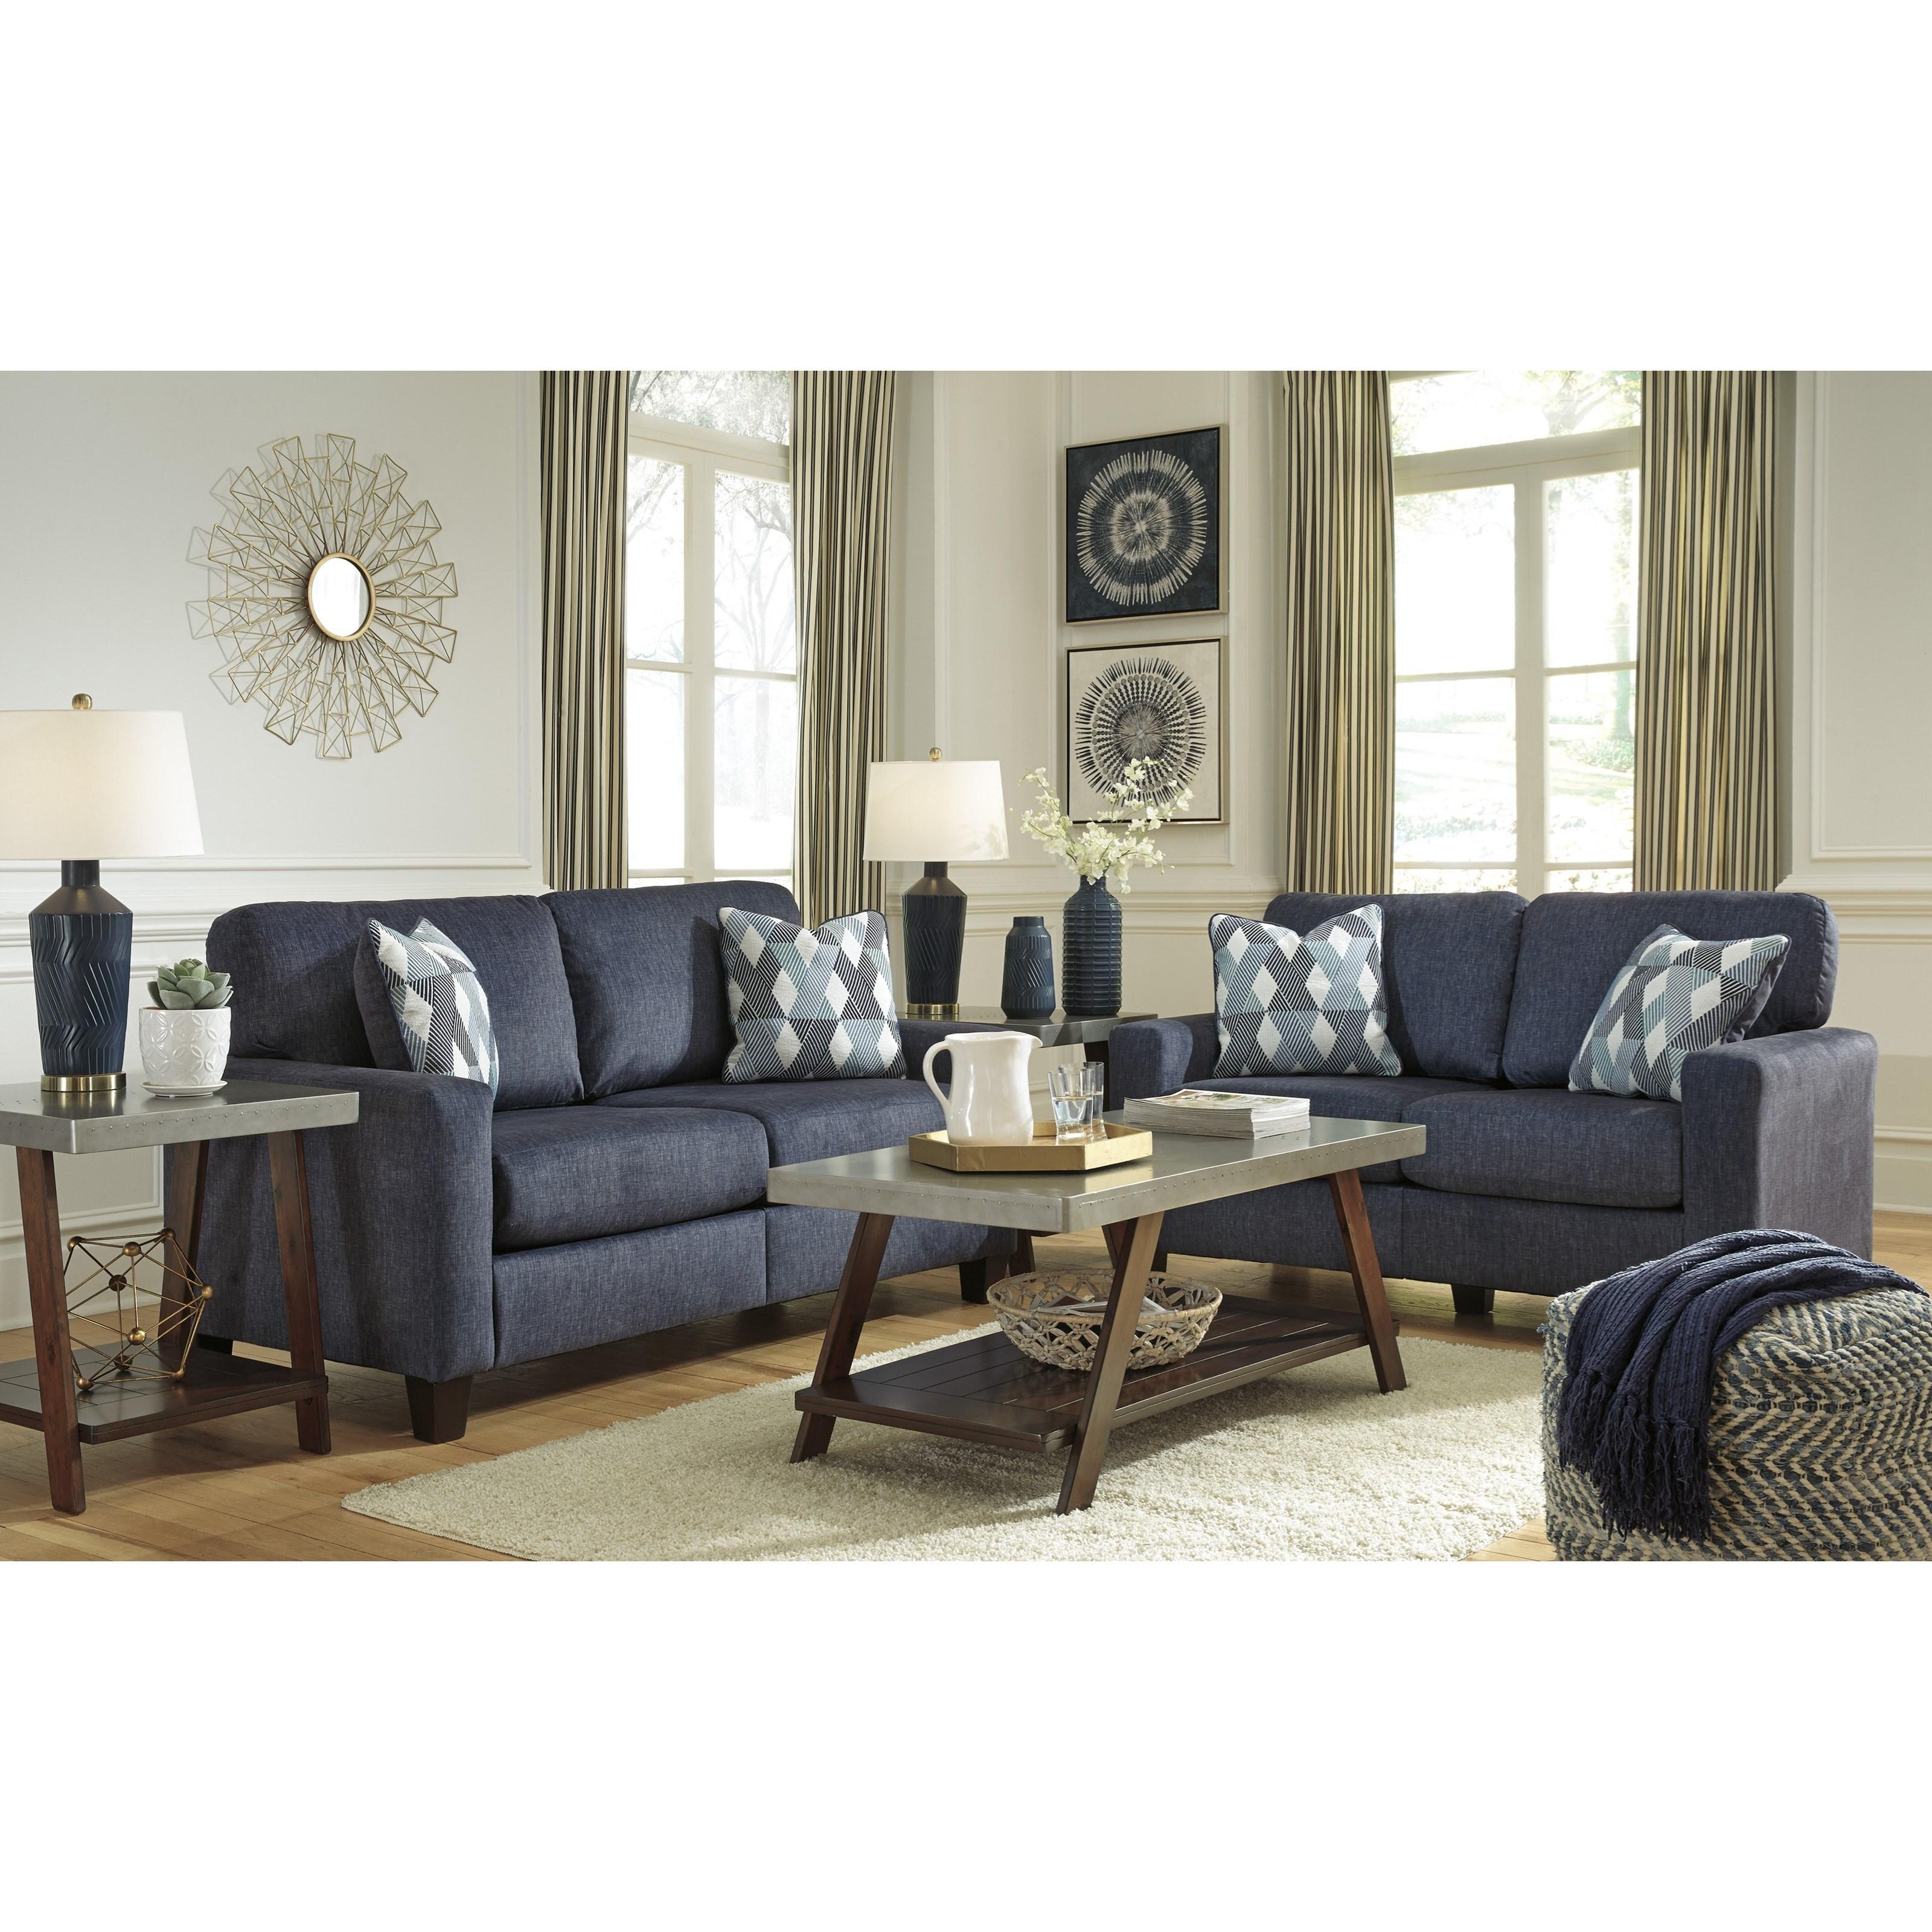 Ashley Furniture Living Room: Signature Design By Ashley Burgos Living Room Group